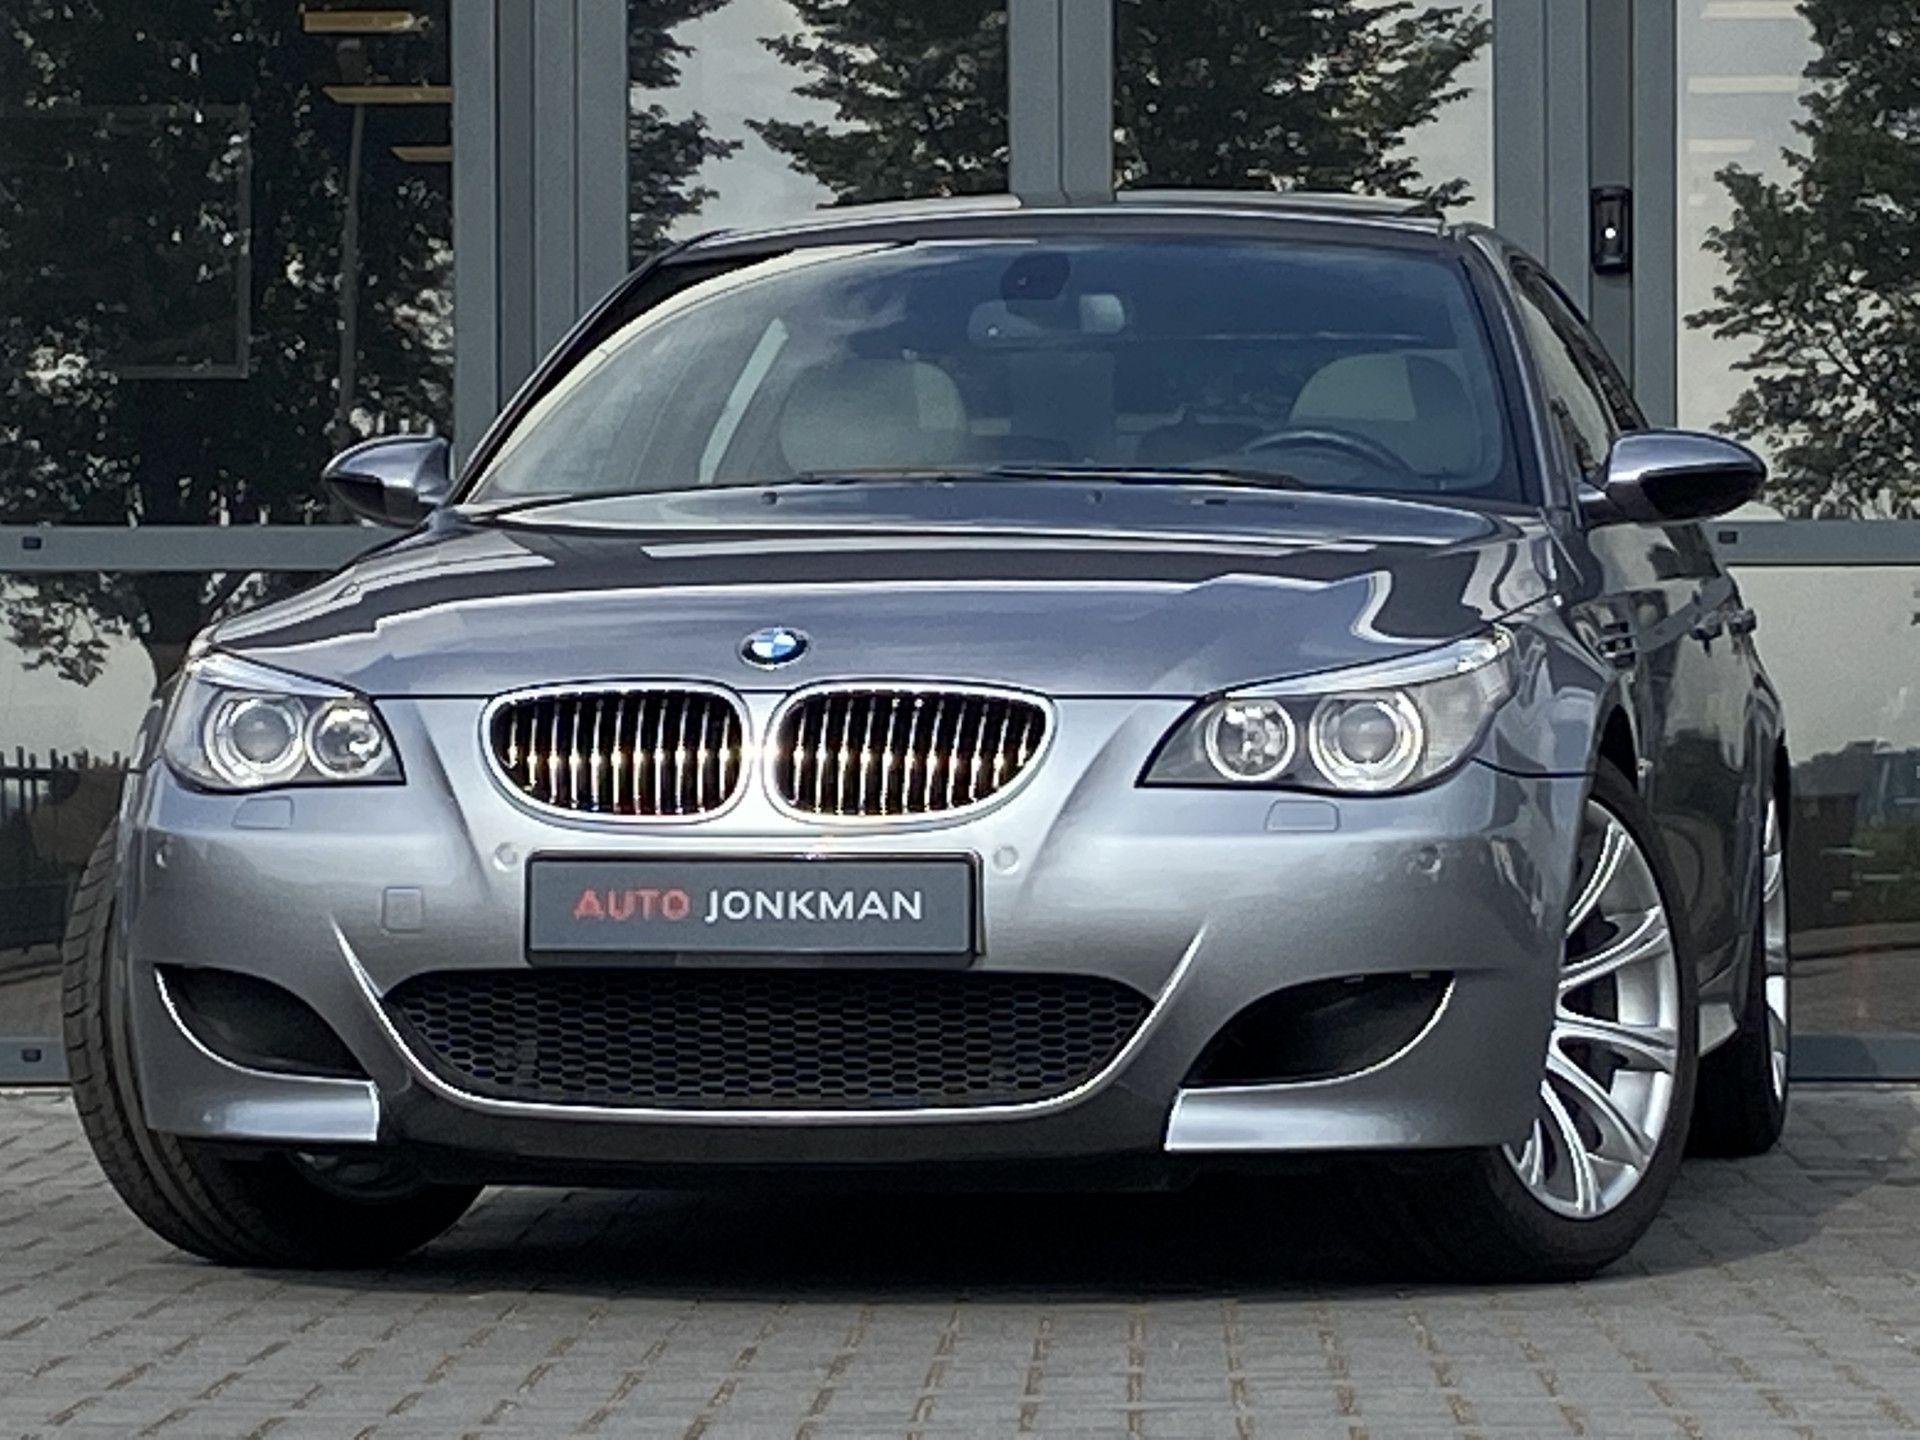 BMW-5 Serie-M5-Auto Jonkman